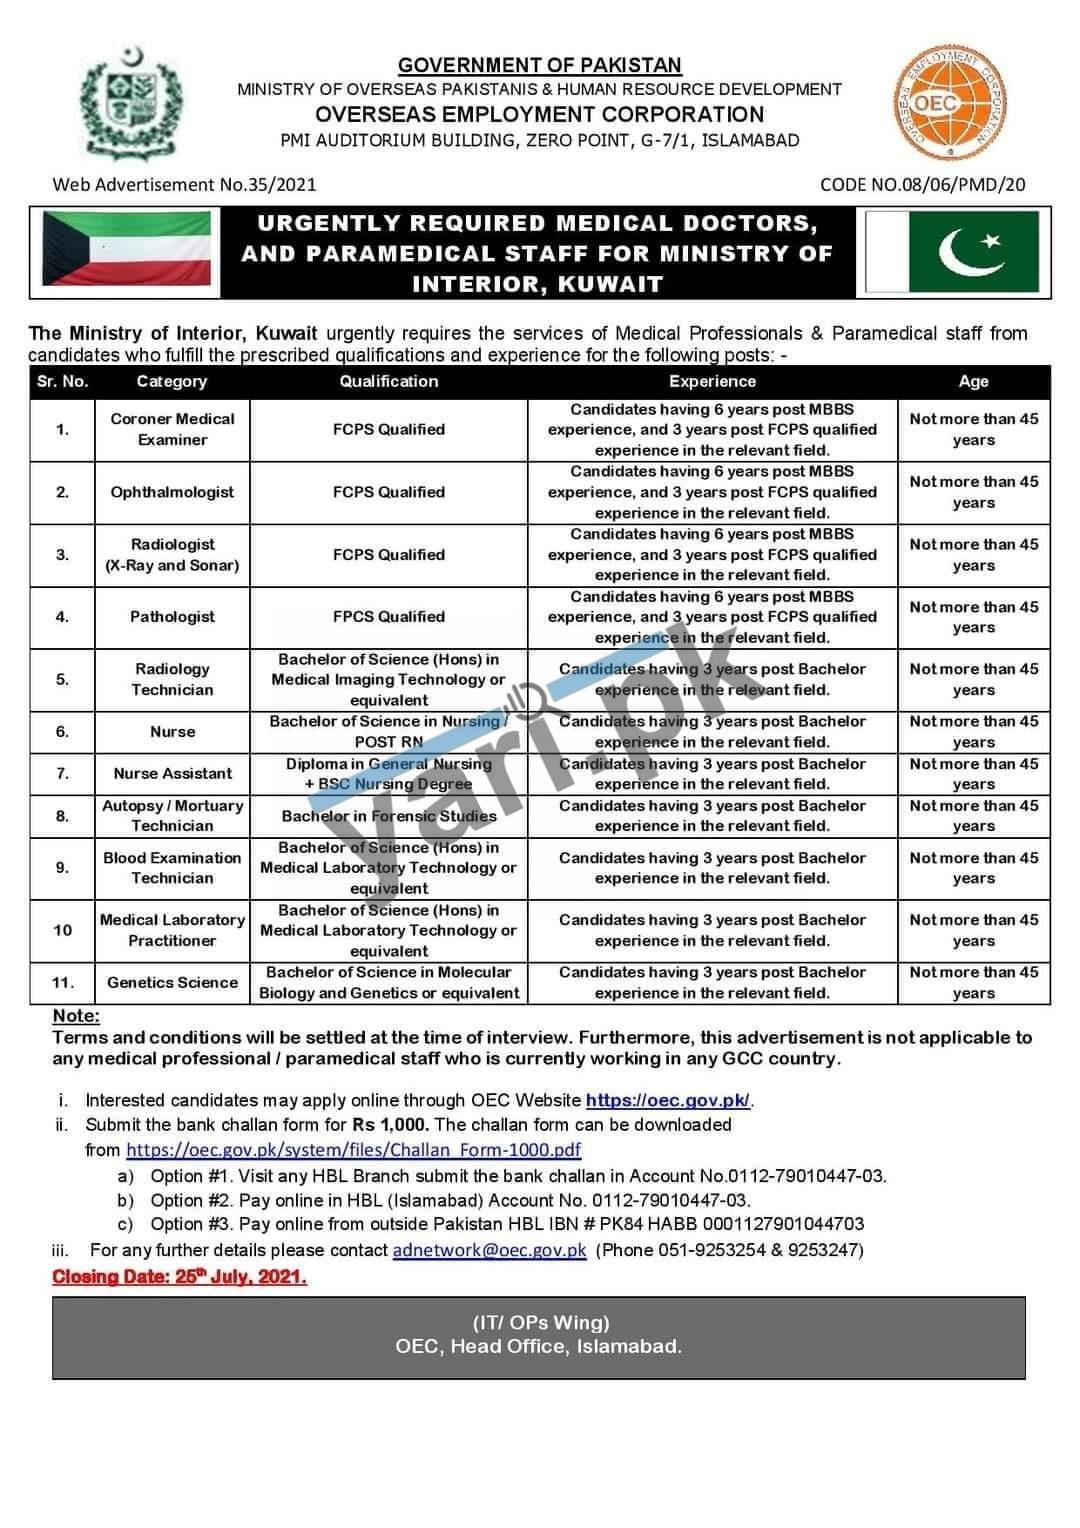 govt-of-pakistan-jobs-2021